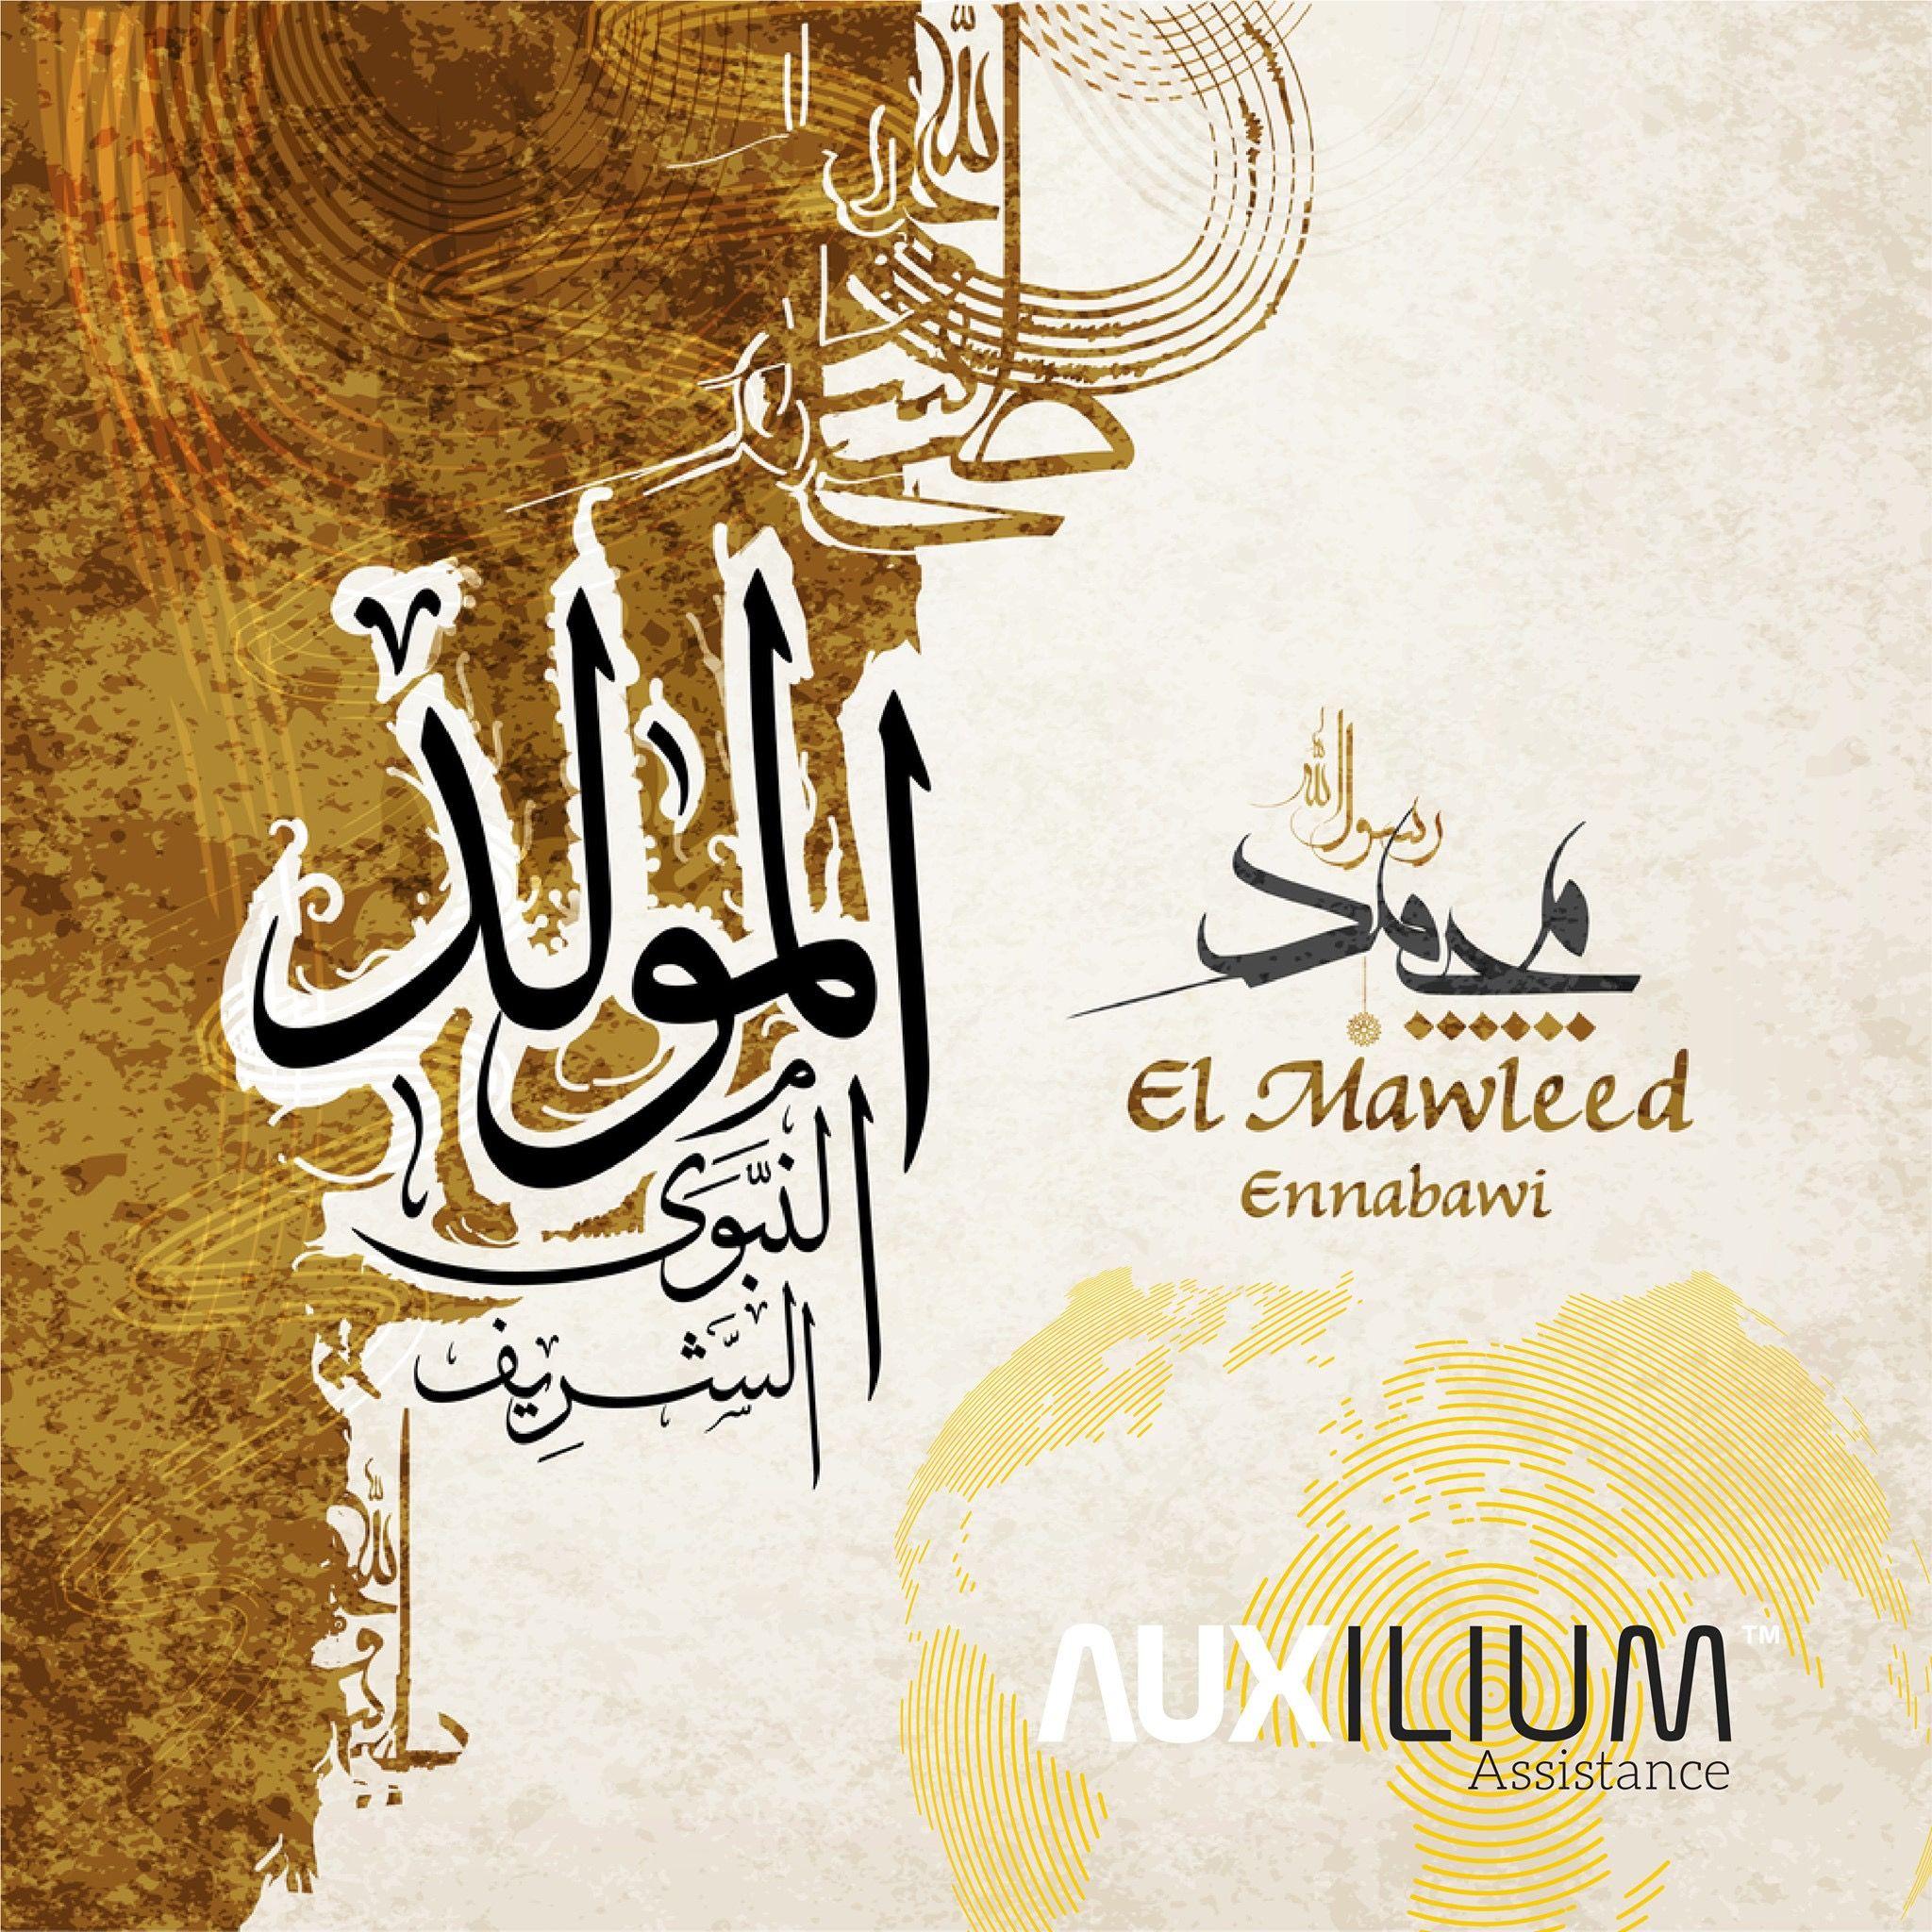 المولد النبوي Islamic Calligraphy Painting Arabic Script Arabic Calligraphy Art